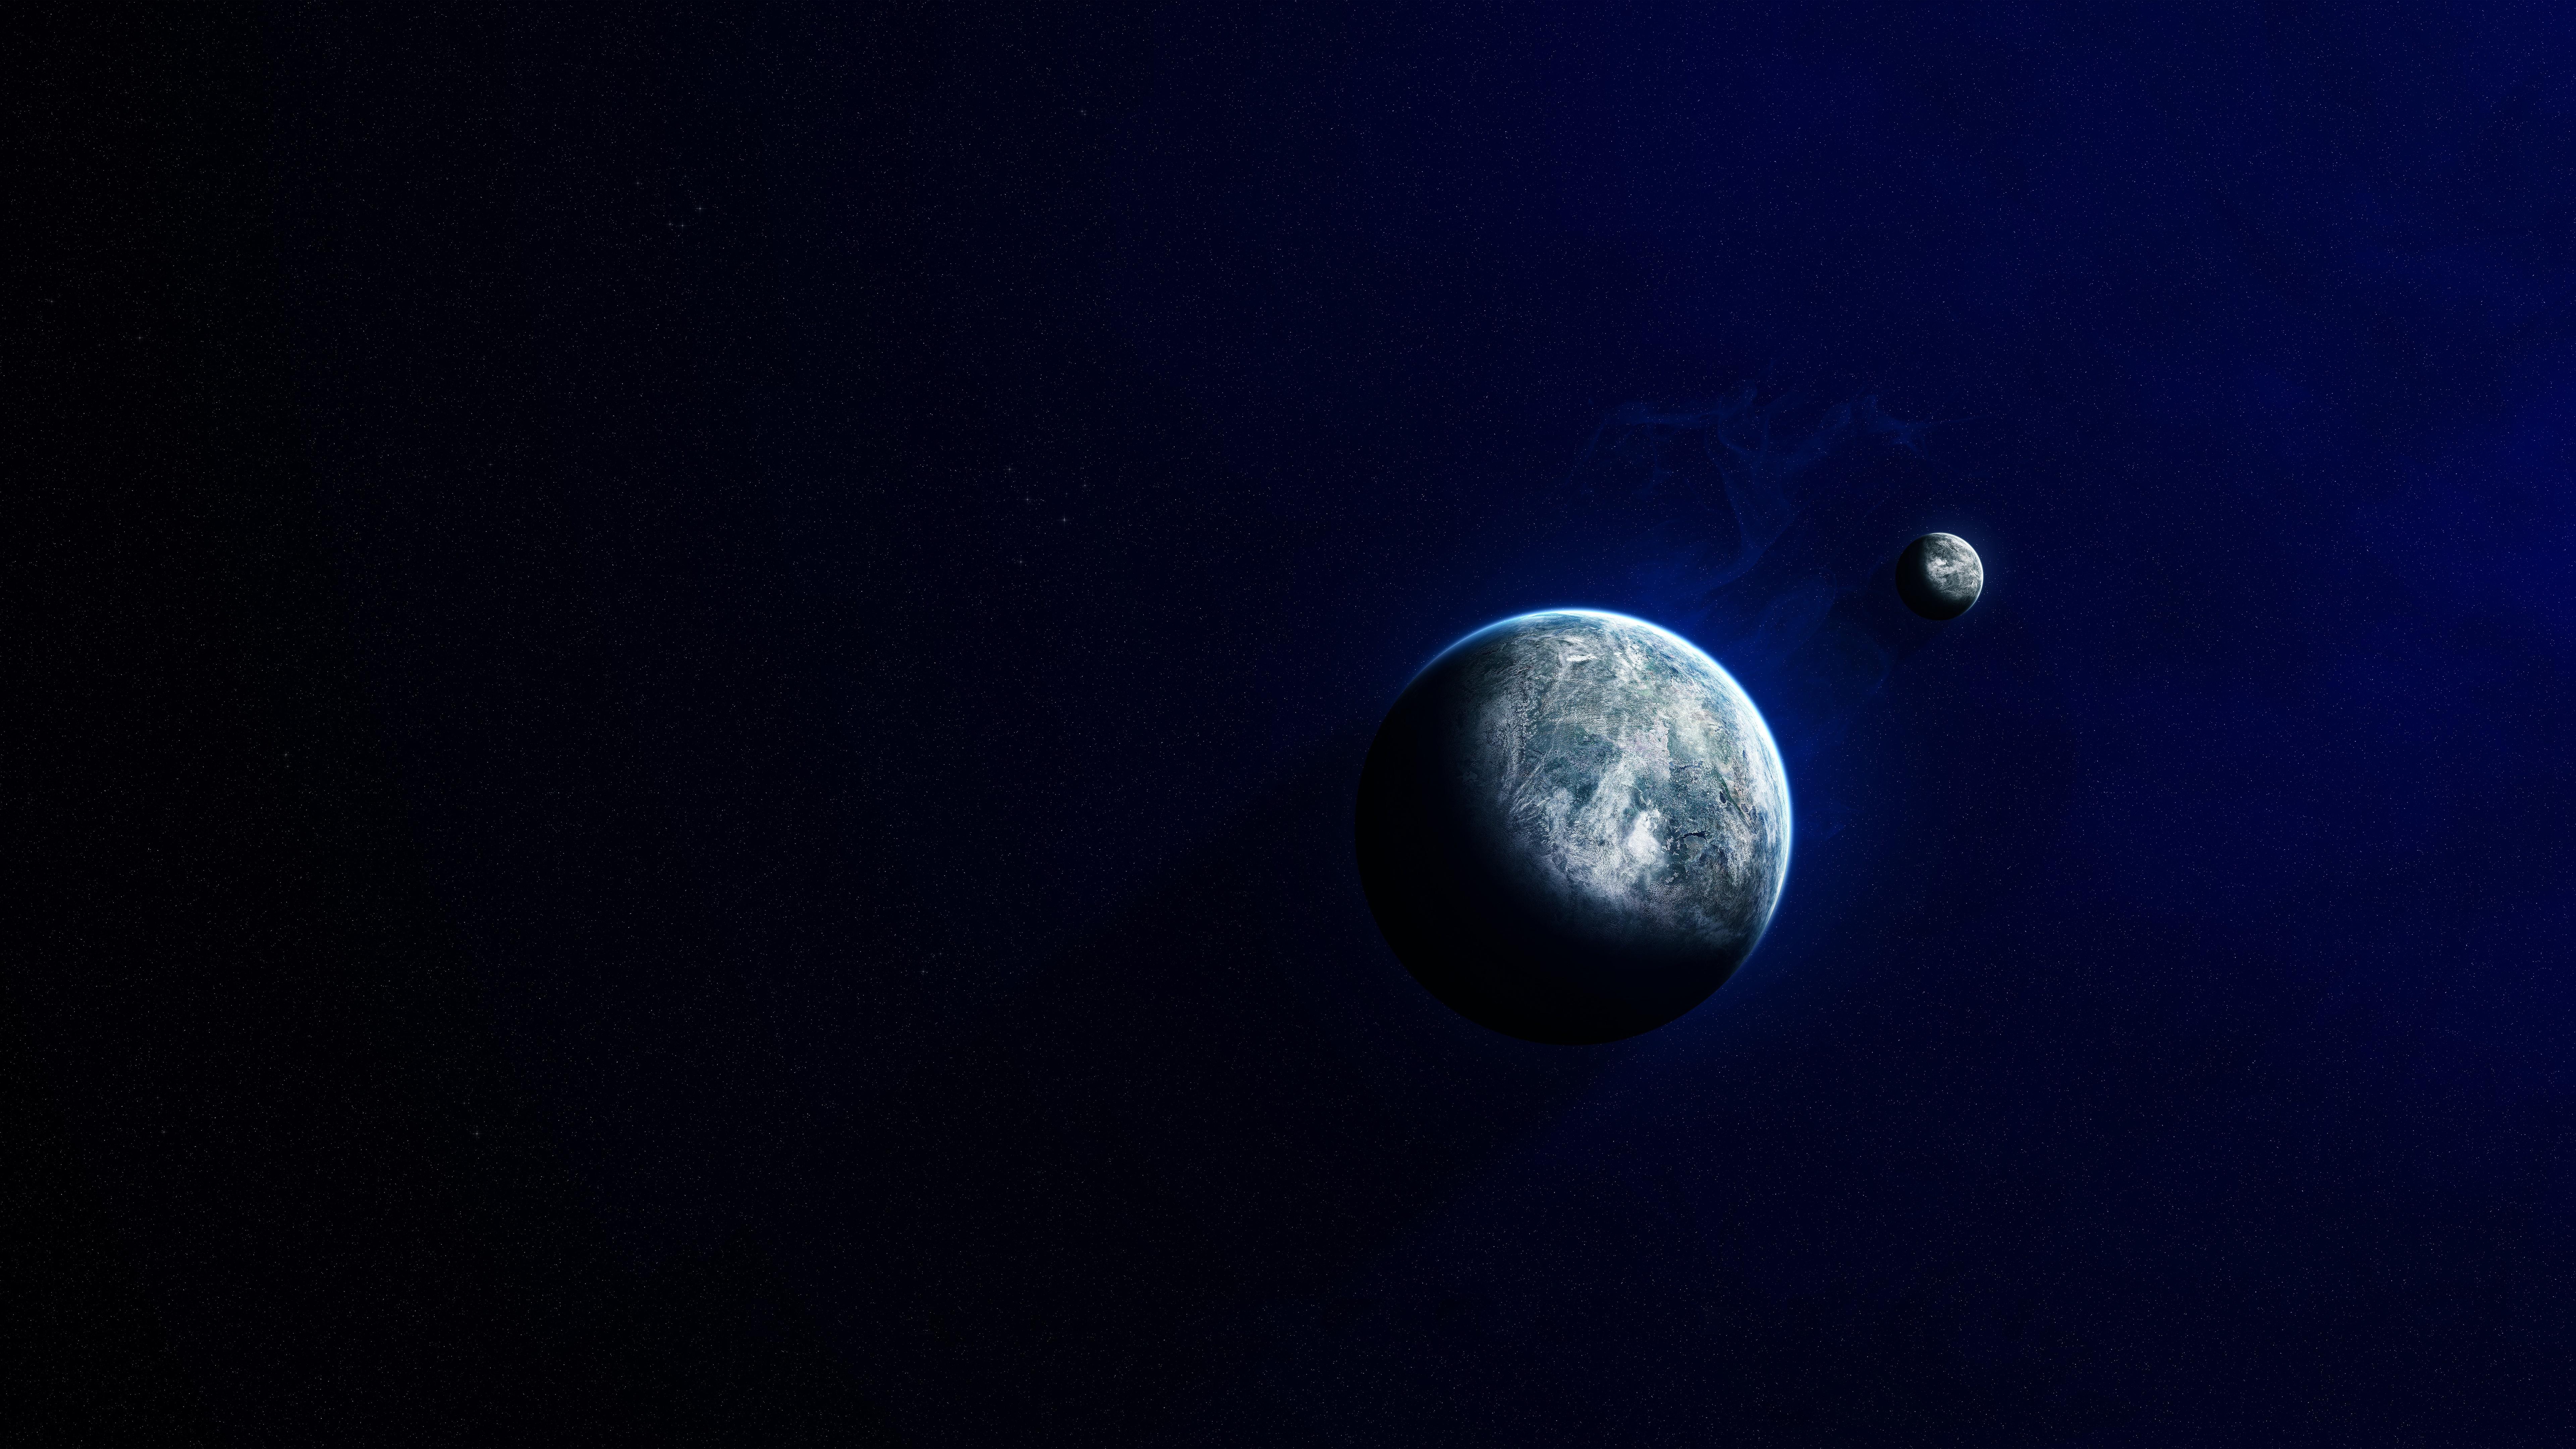 Картинка: Планета, спутник, свет, космос